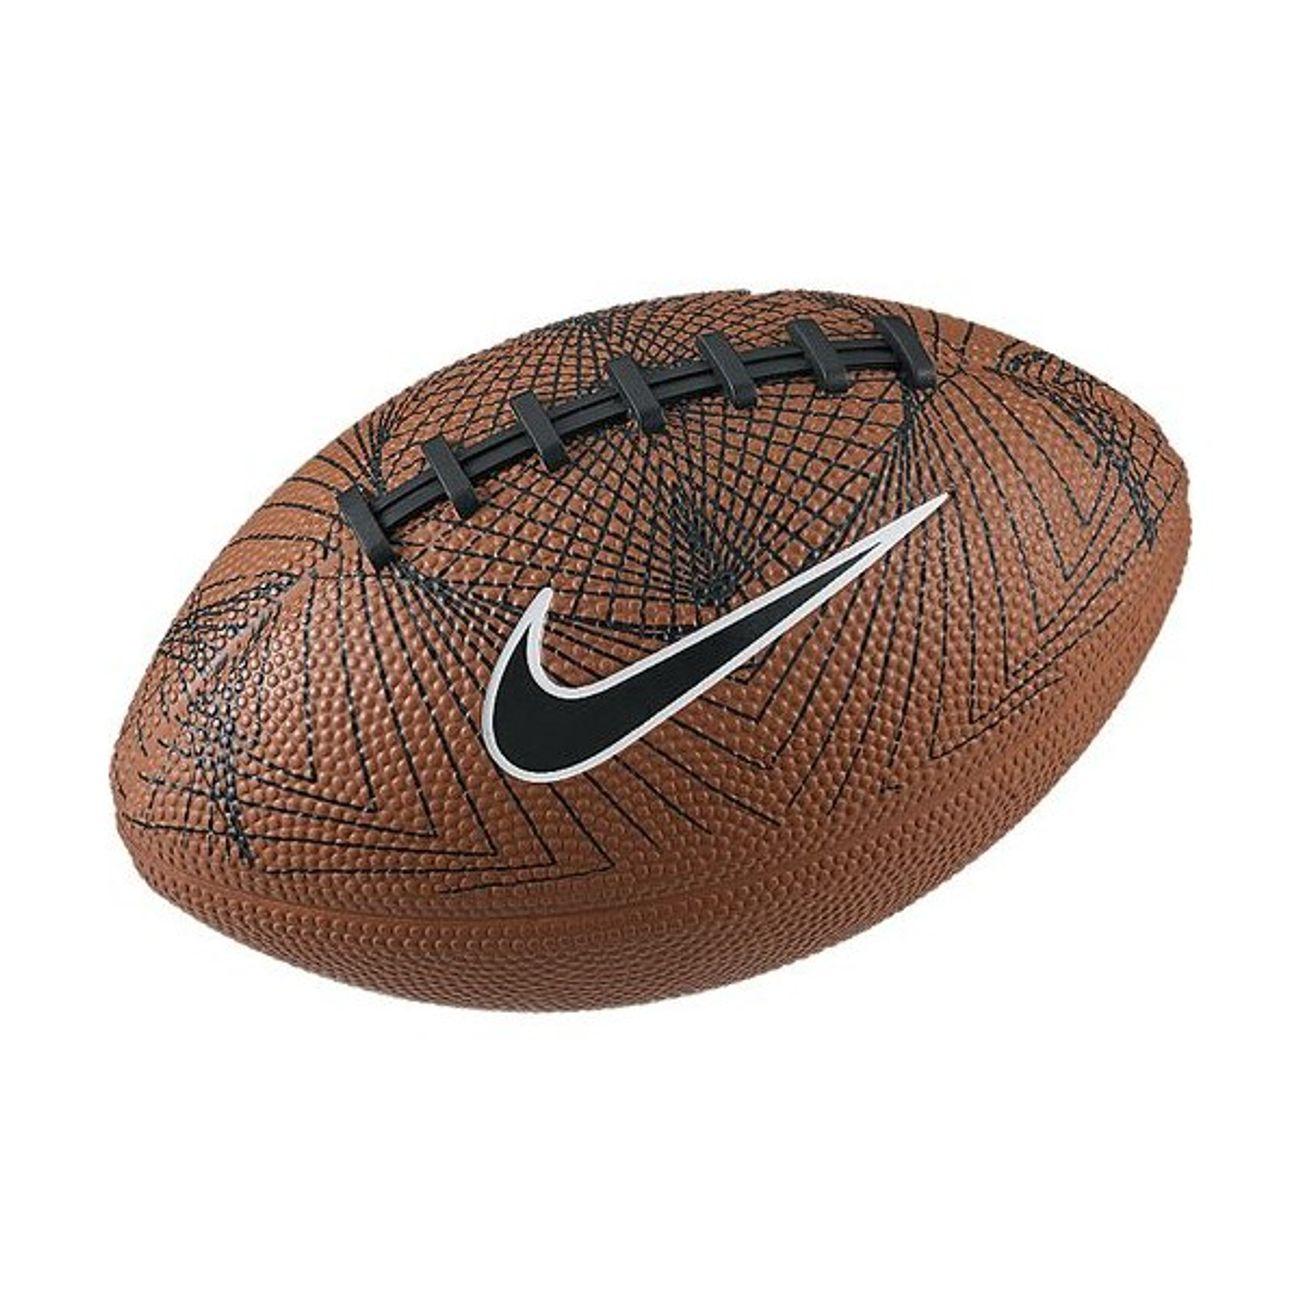 Mini ballon de Football Américain Nike 500 marron – achat et prix ... 70c188aa017